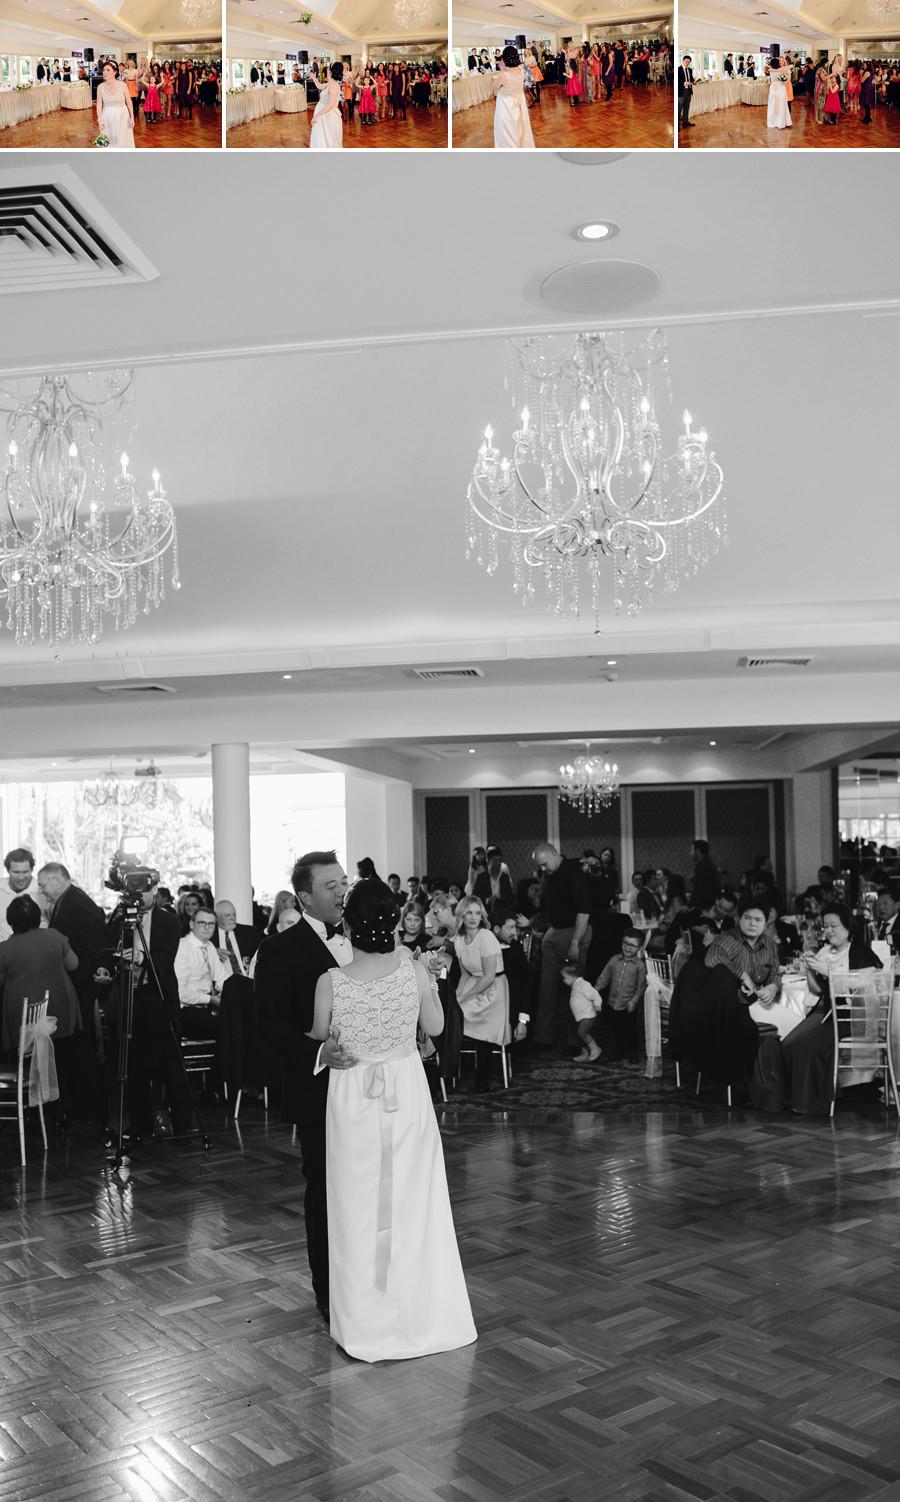 Oatlands Wedding Photography: Reception